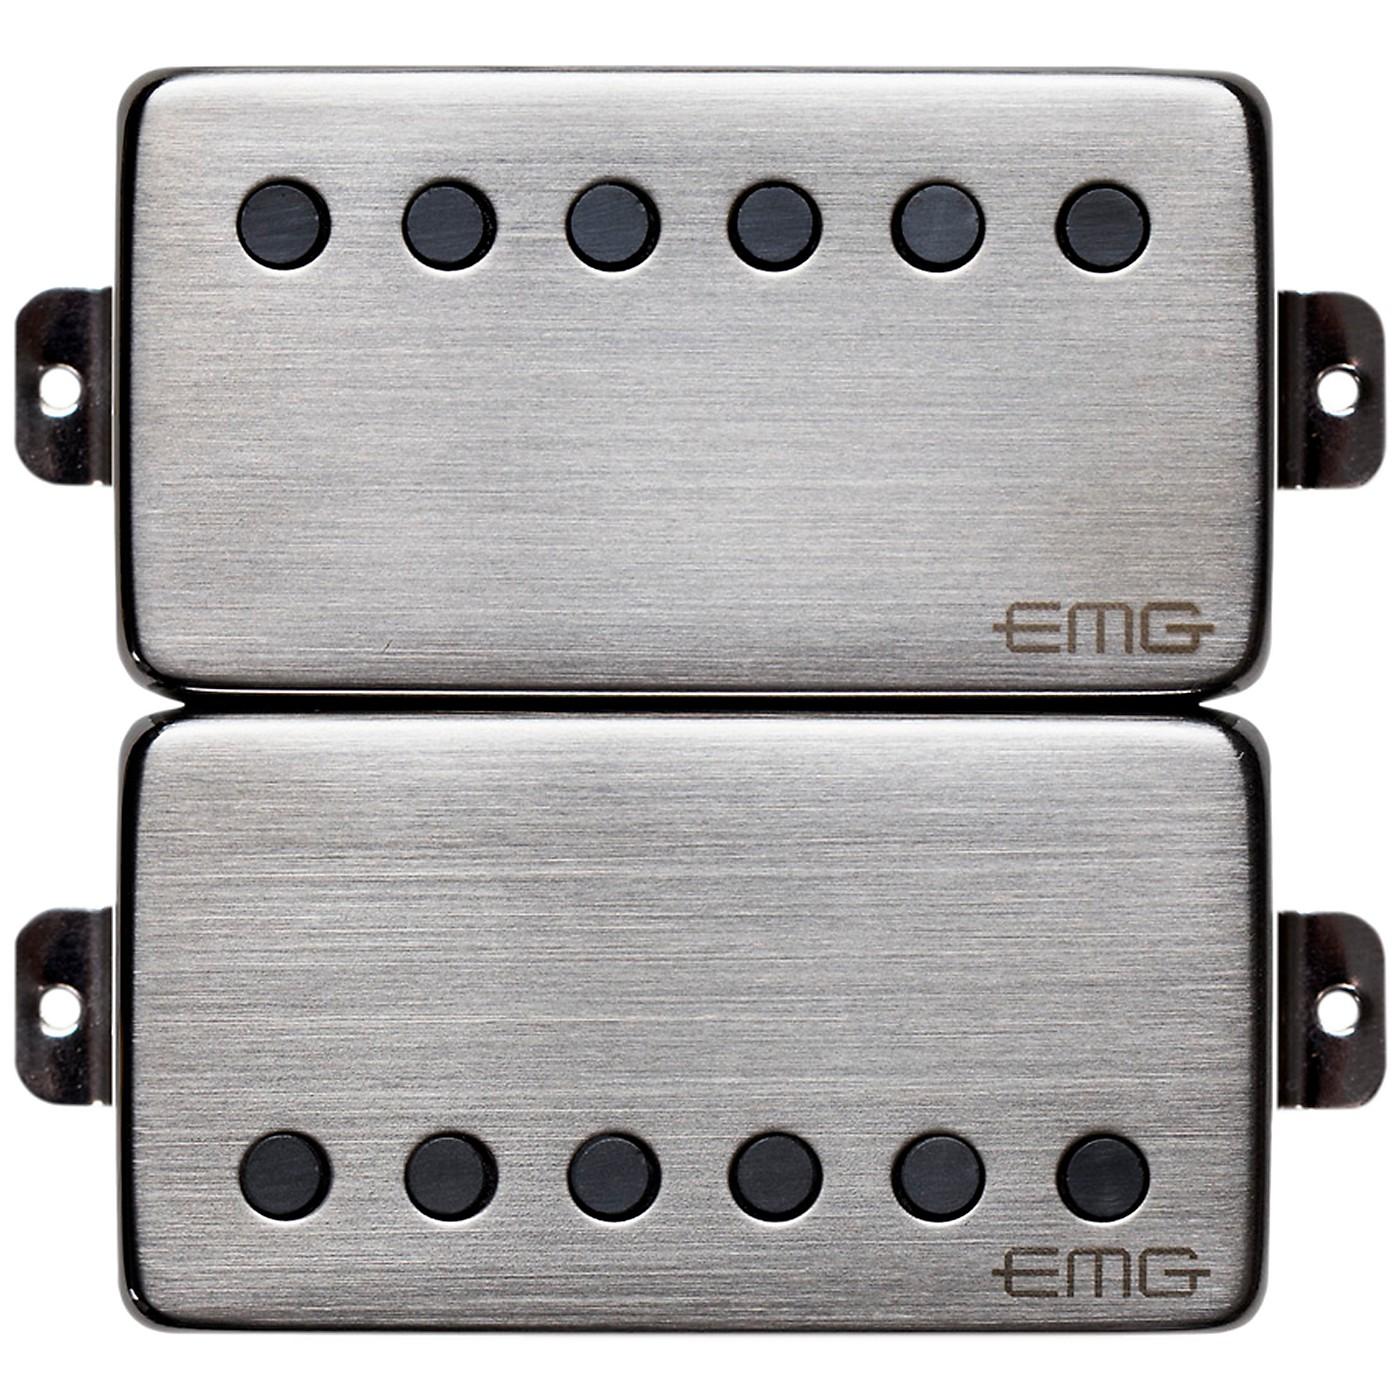 EMG 57/66 Set thumbnail